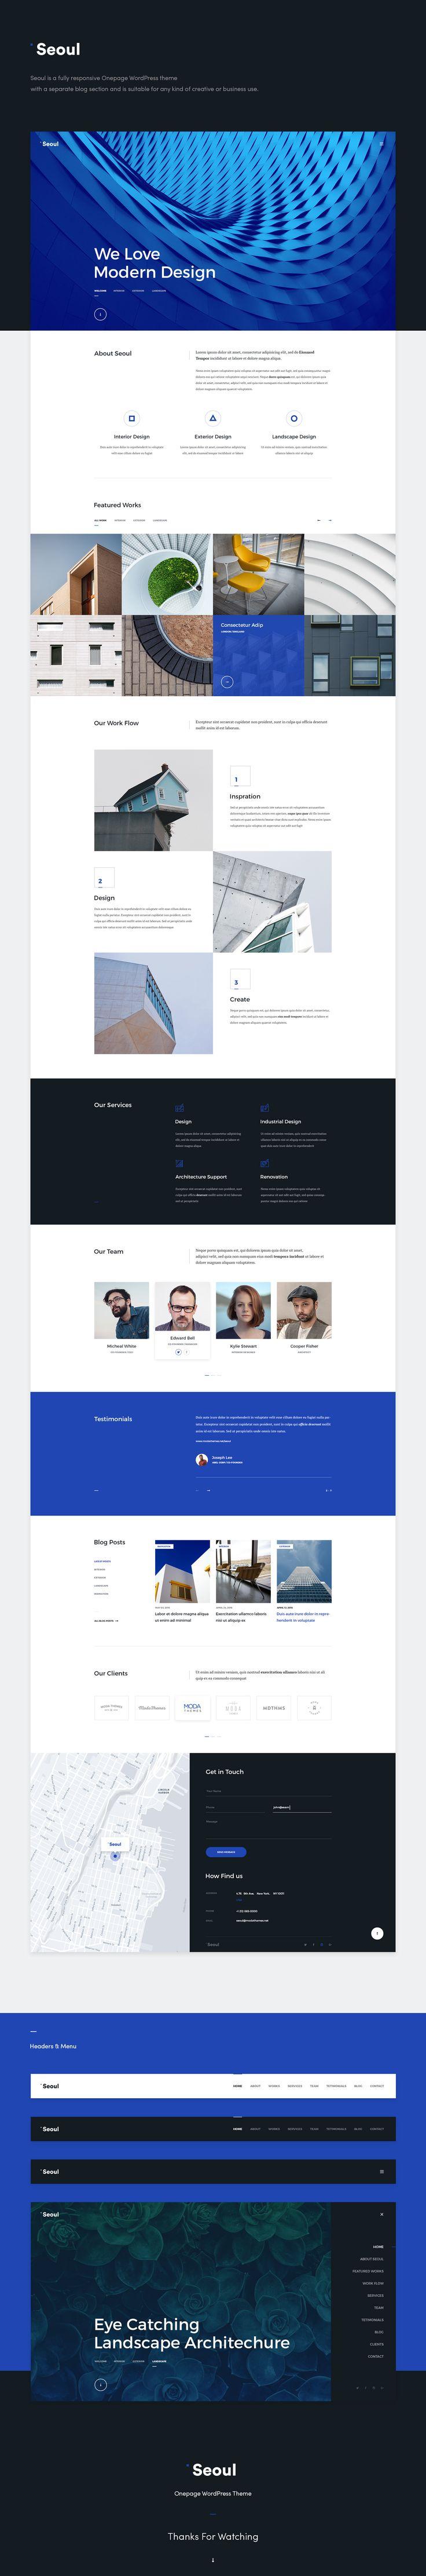 Seoul - WordPress Theme on Behance